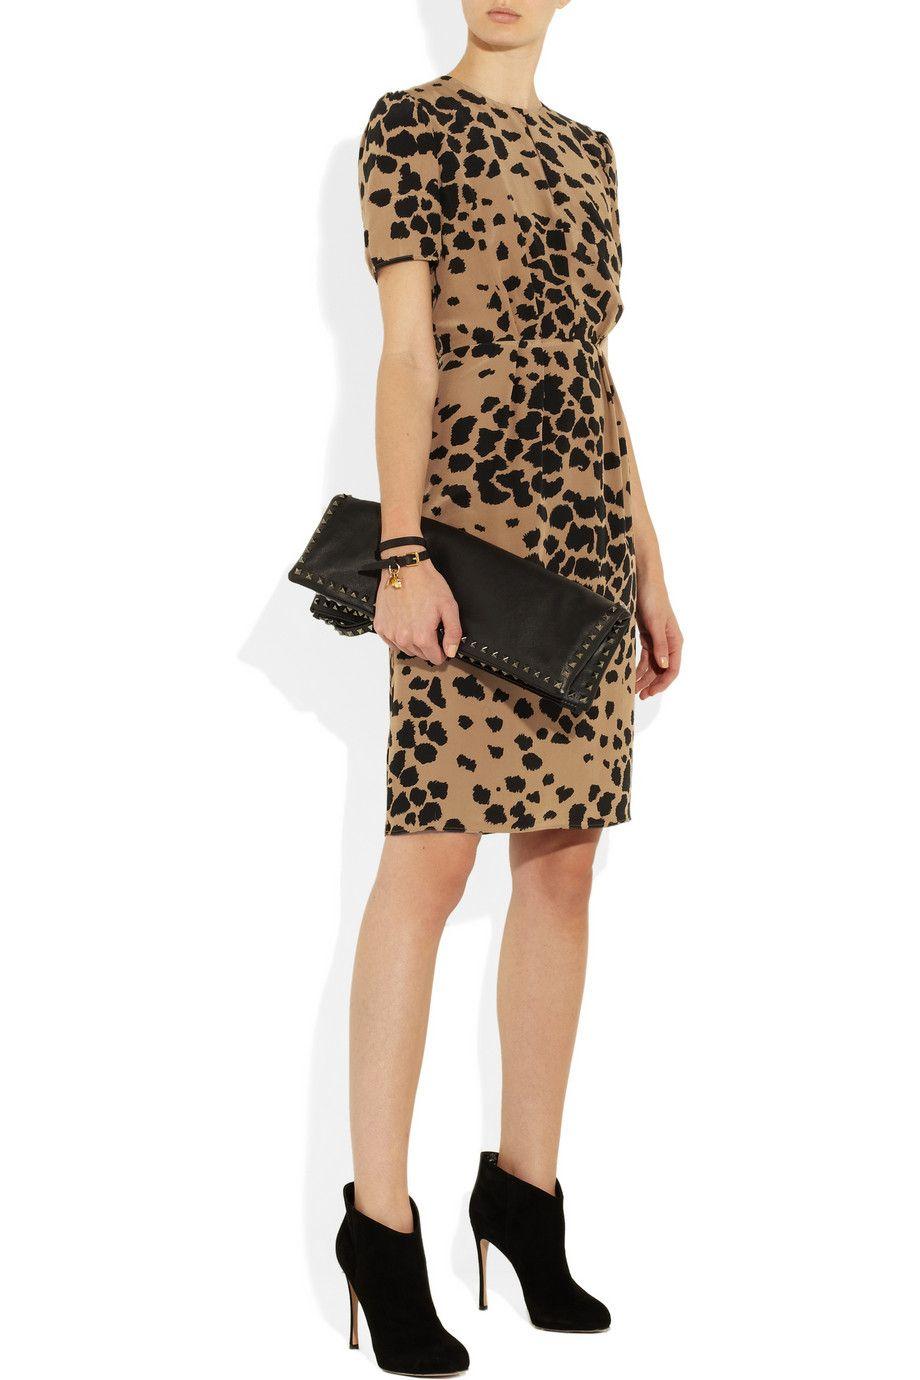 Burberry London dress, Alexander McQueen bracelet, Maison Martin Margiela ring, Gianvito Rossi shoes, Valentino clutch.